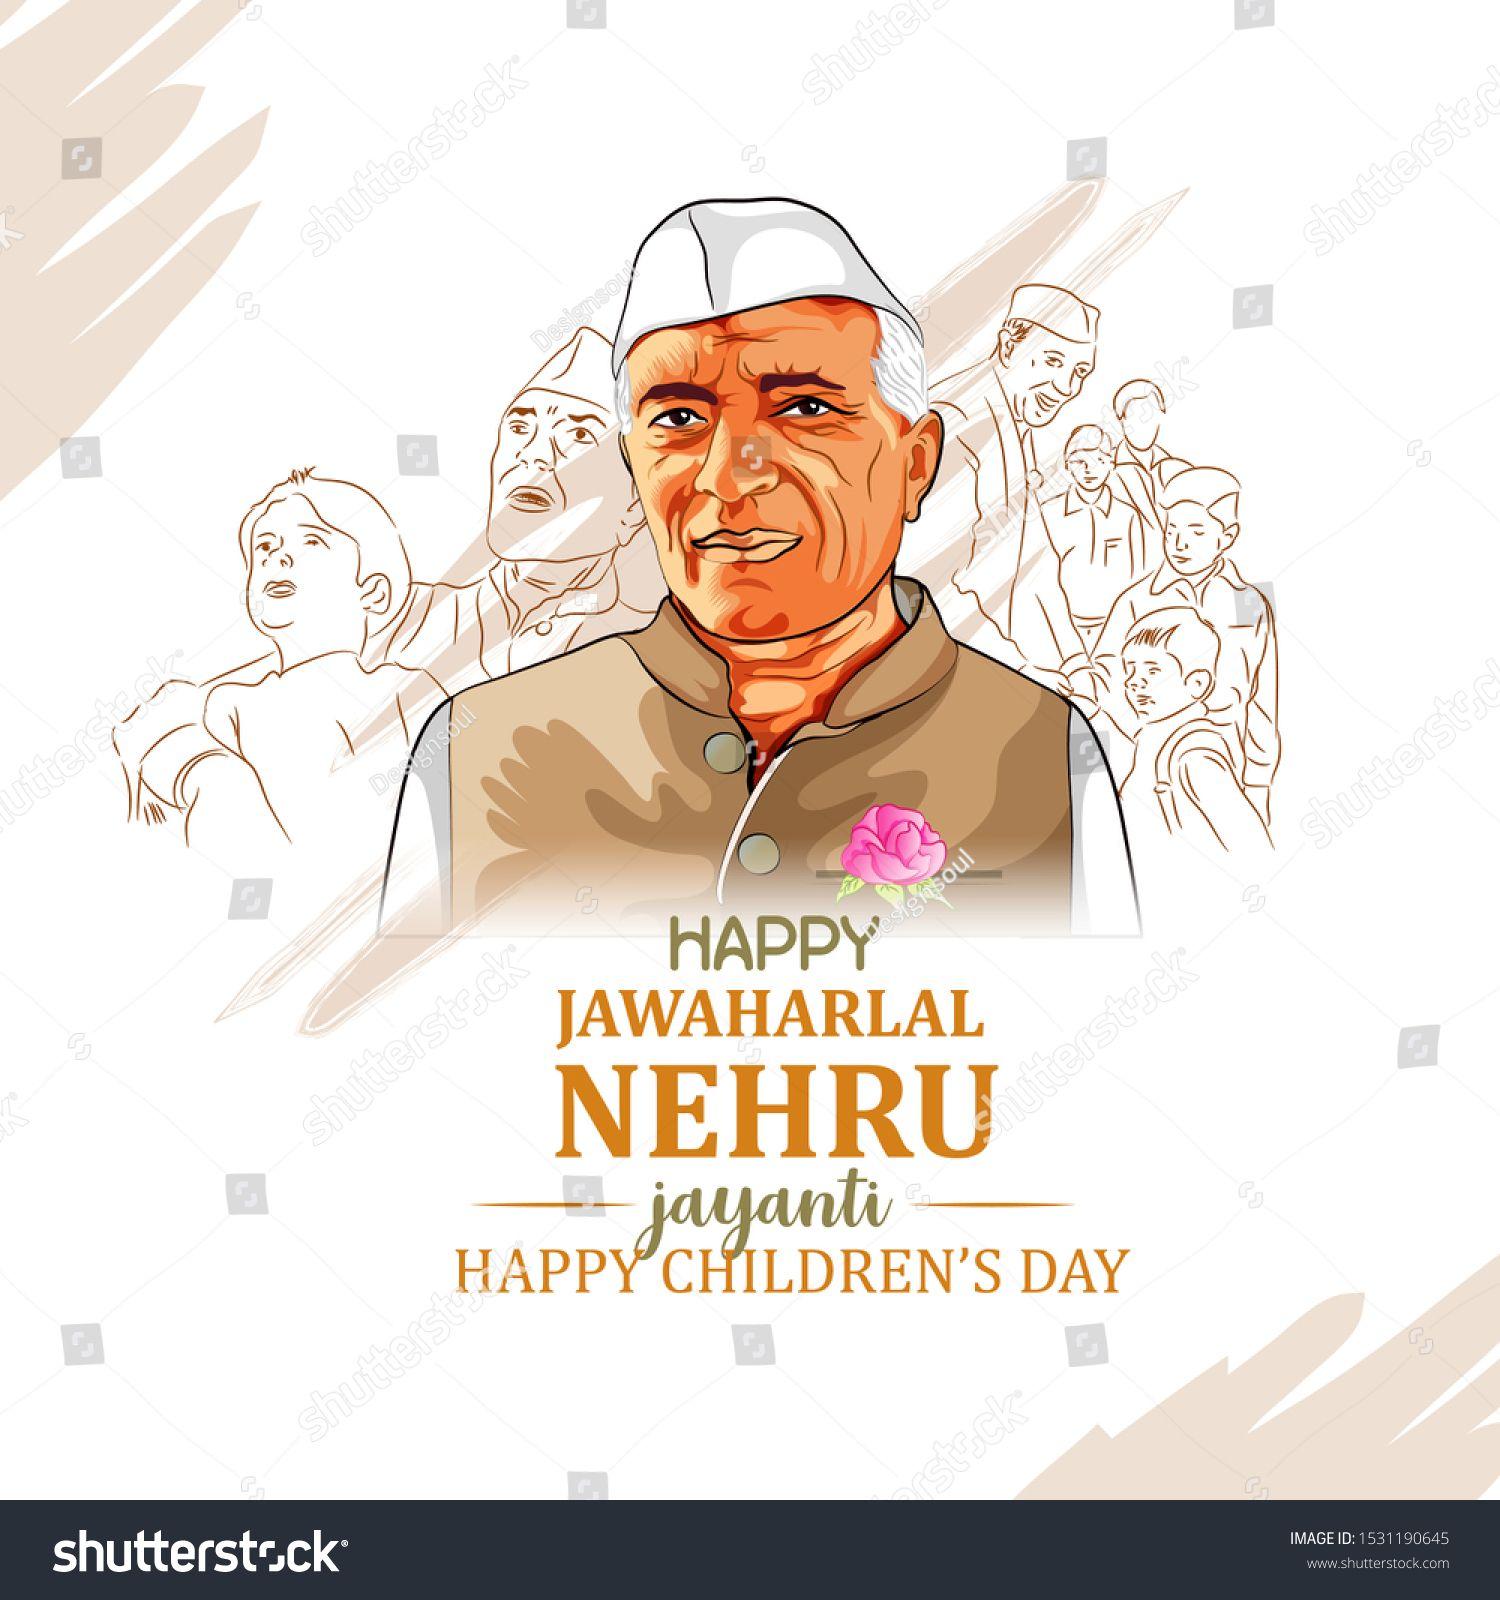 Nehru Jayanti first Indian Prime Minister Sponsored , ad